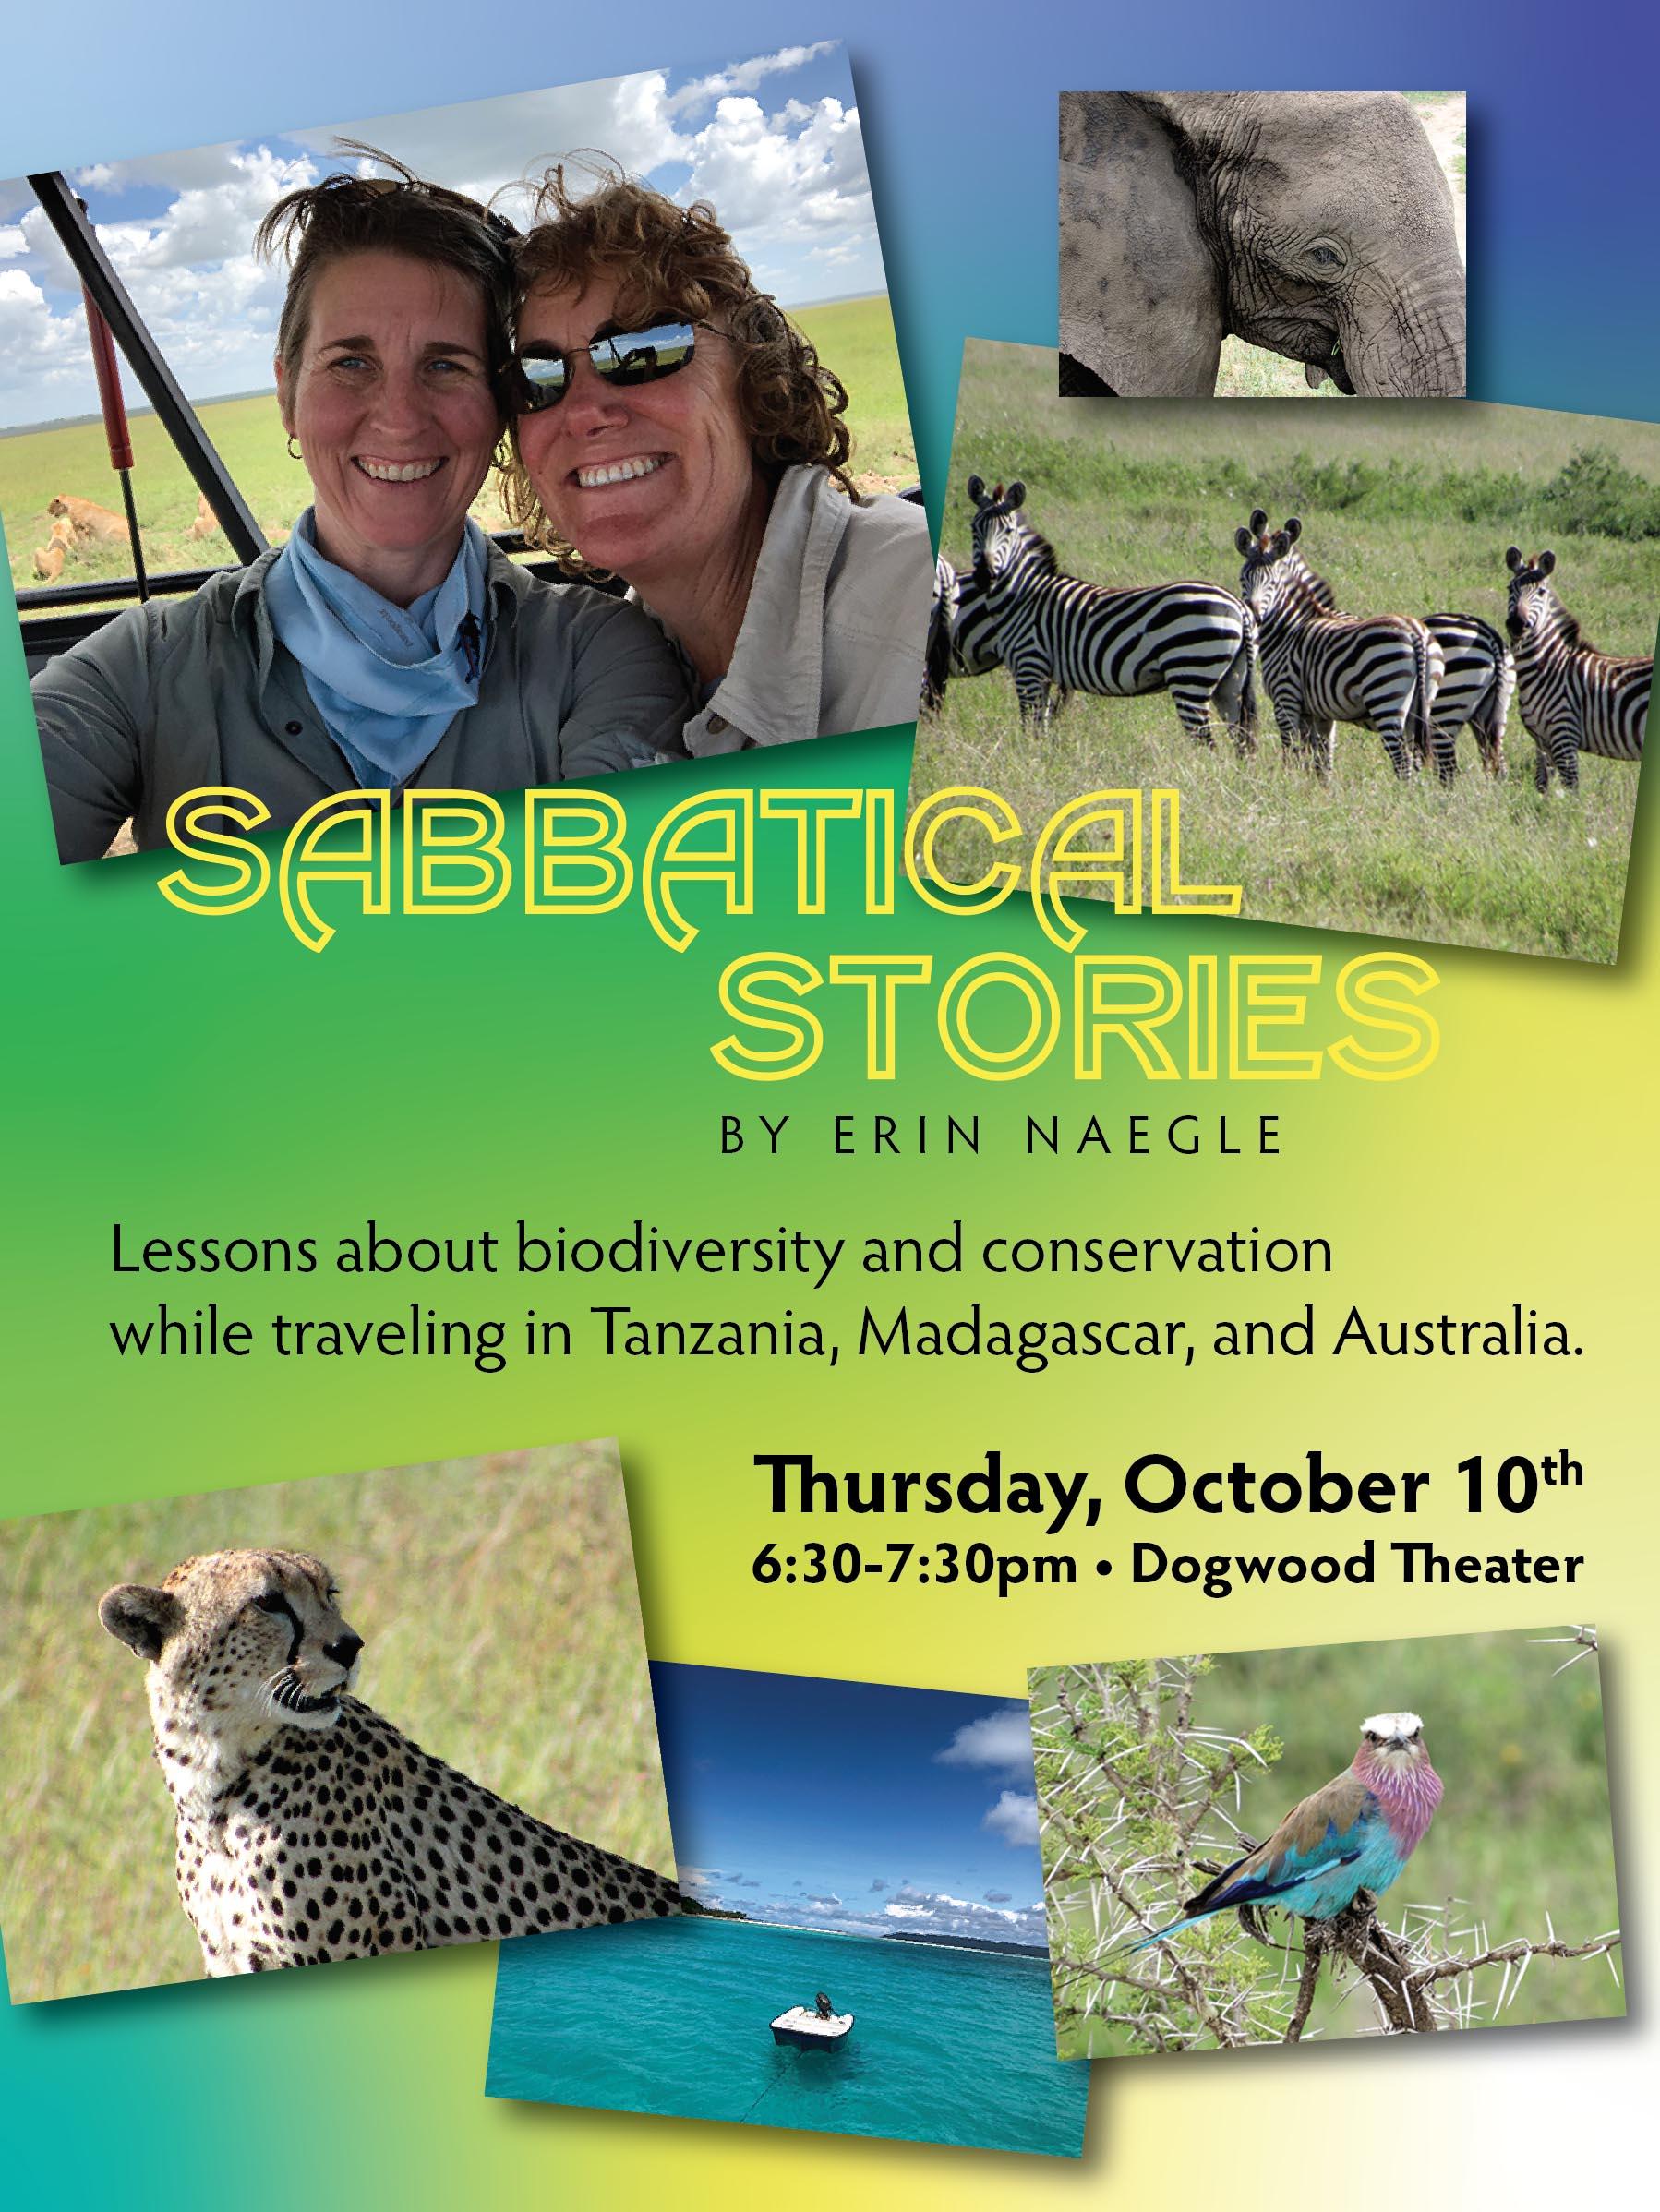 sabbatical stories-advert